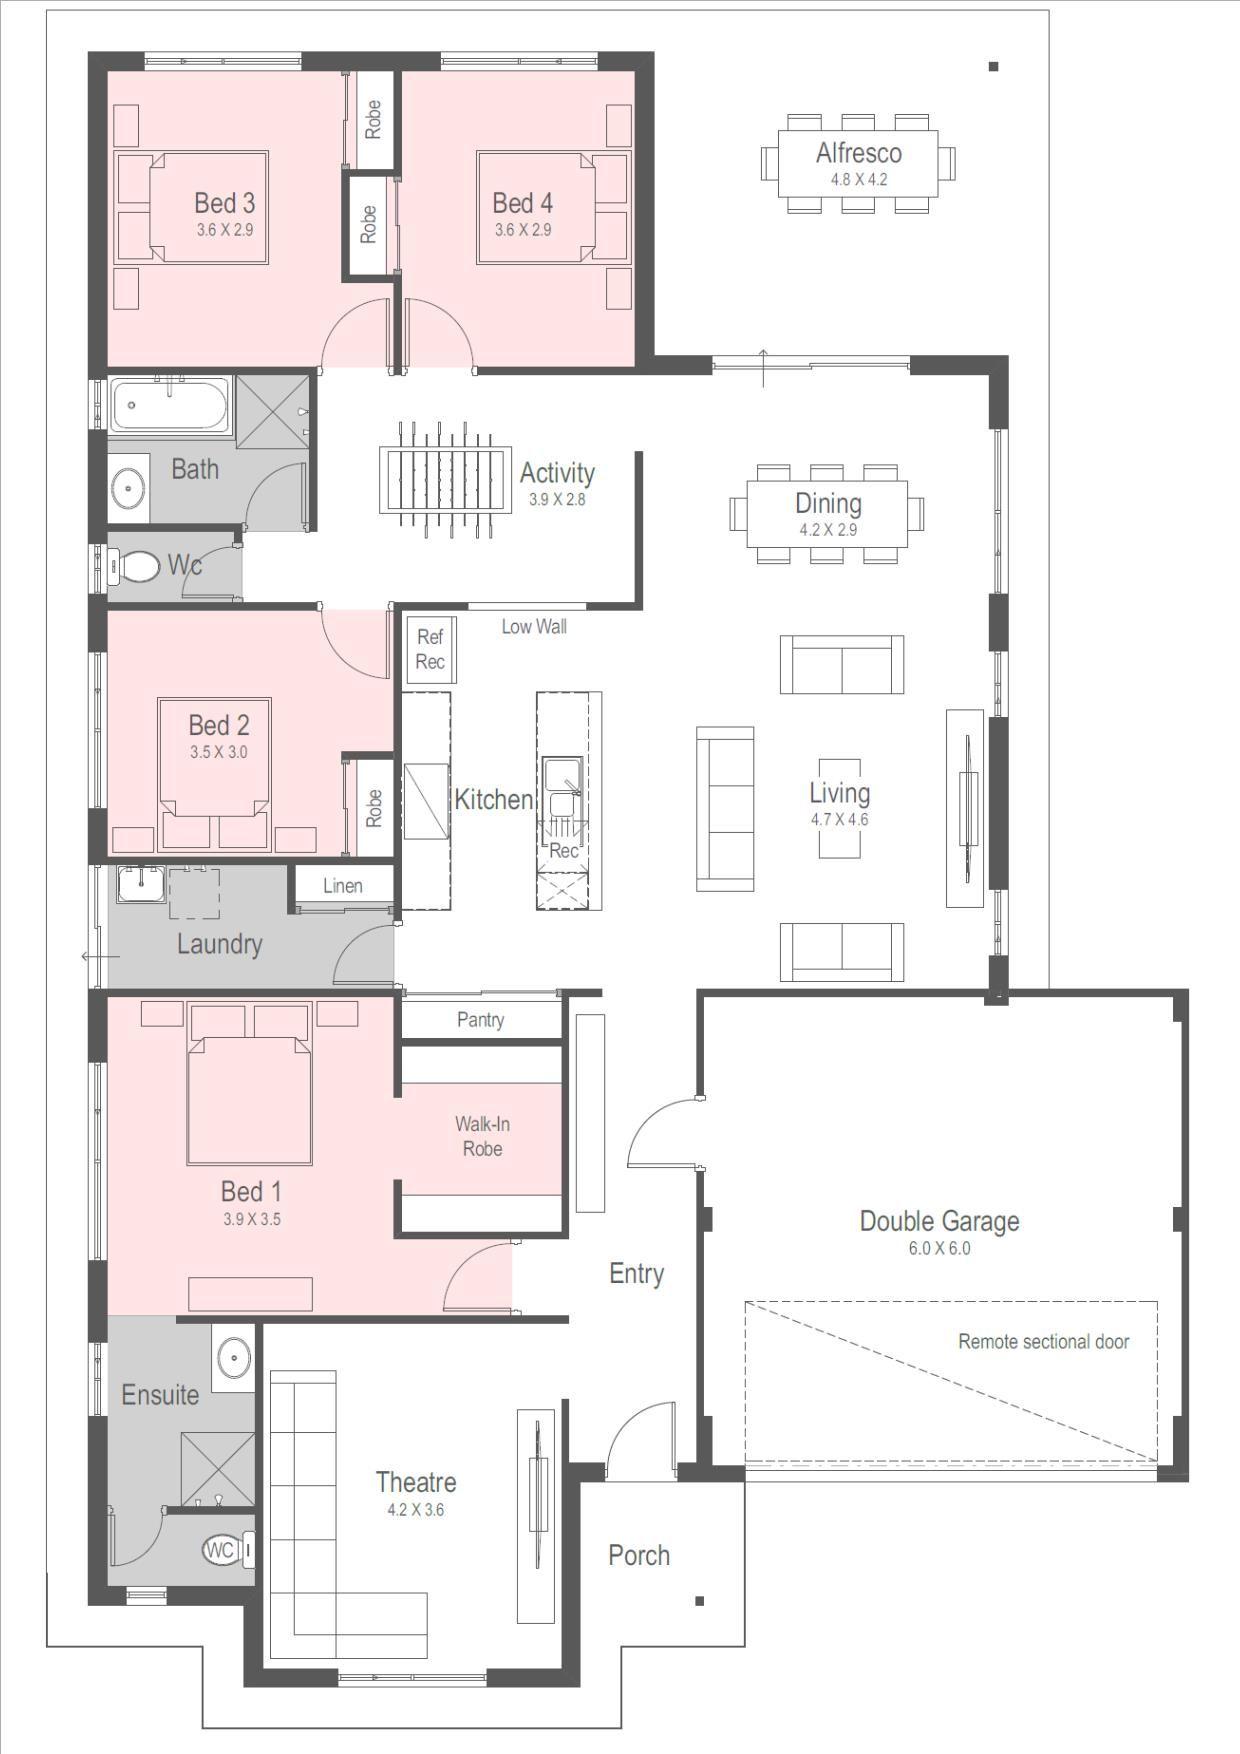 House Designs New Home Designs Perth Homebuyers Centre Building Plans House House Plans House Floor Plans